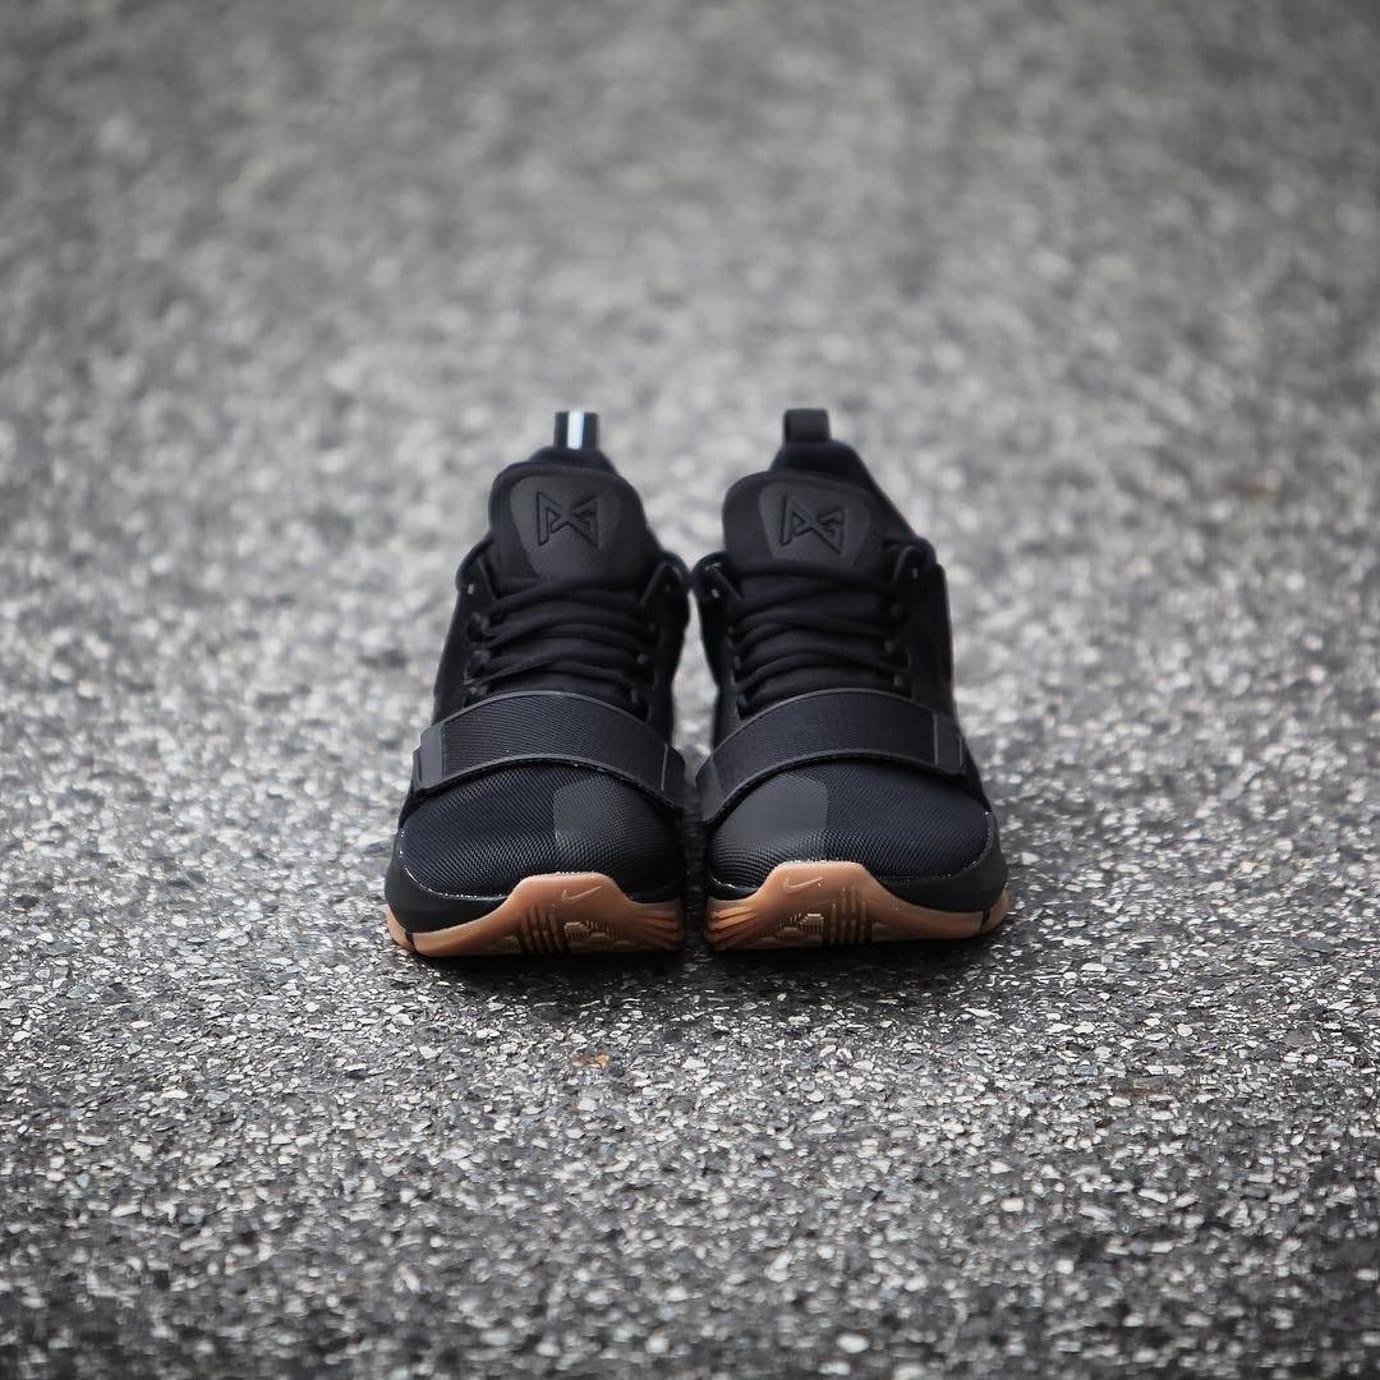 Nike PG1 Black Gum Release Date 878627-004 (6)